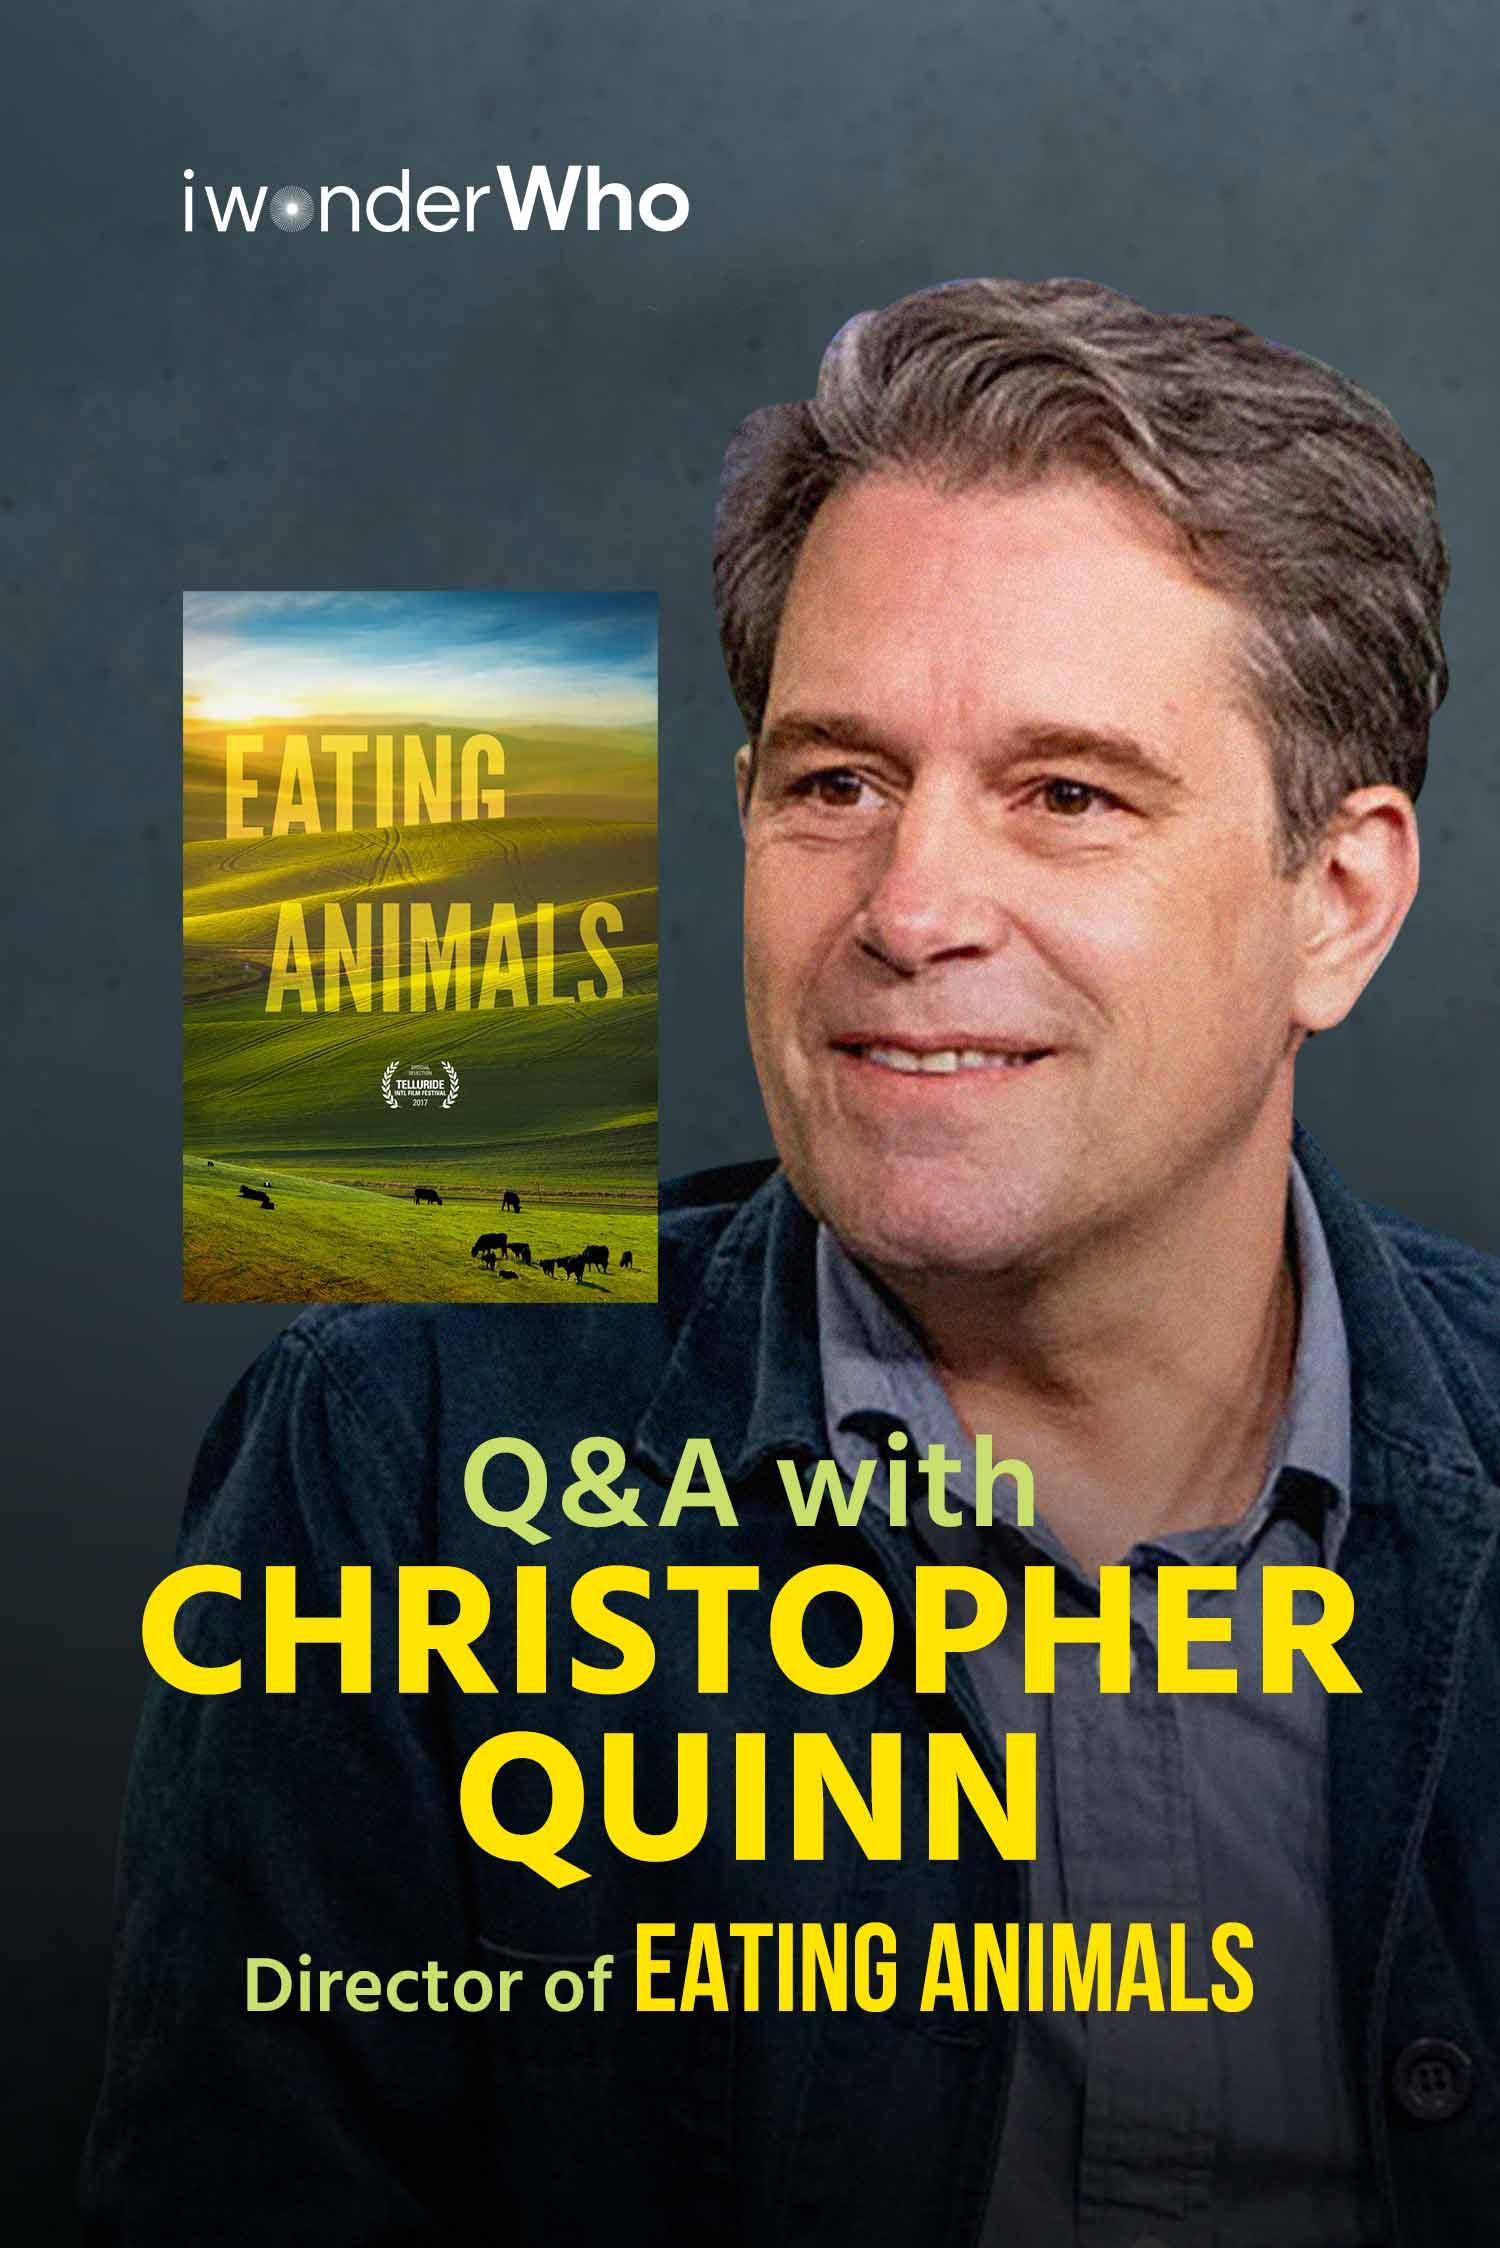 iwonderWho - Christopher Quinn (Eating Animals)